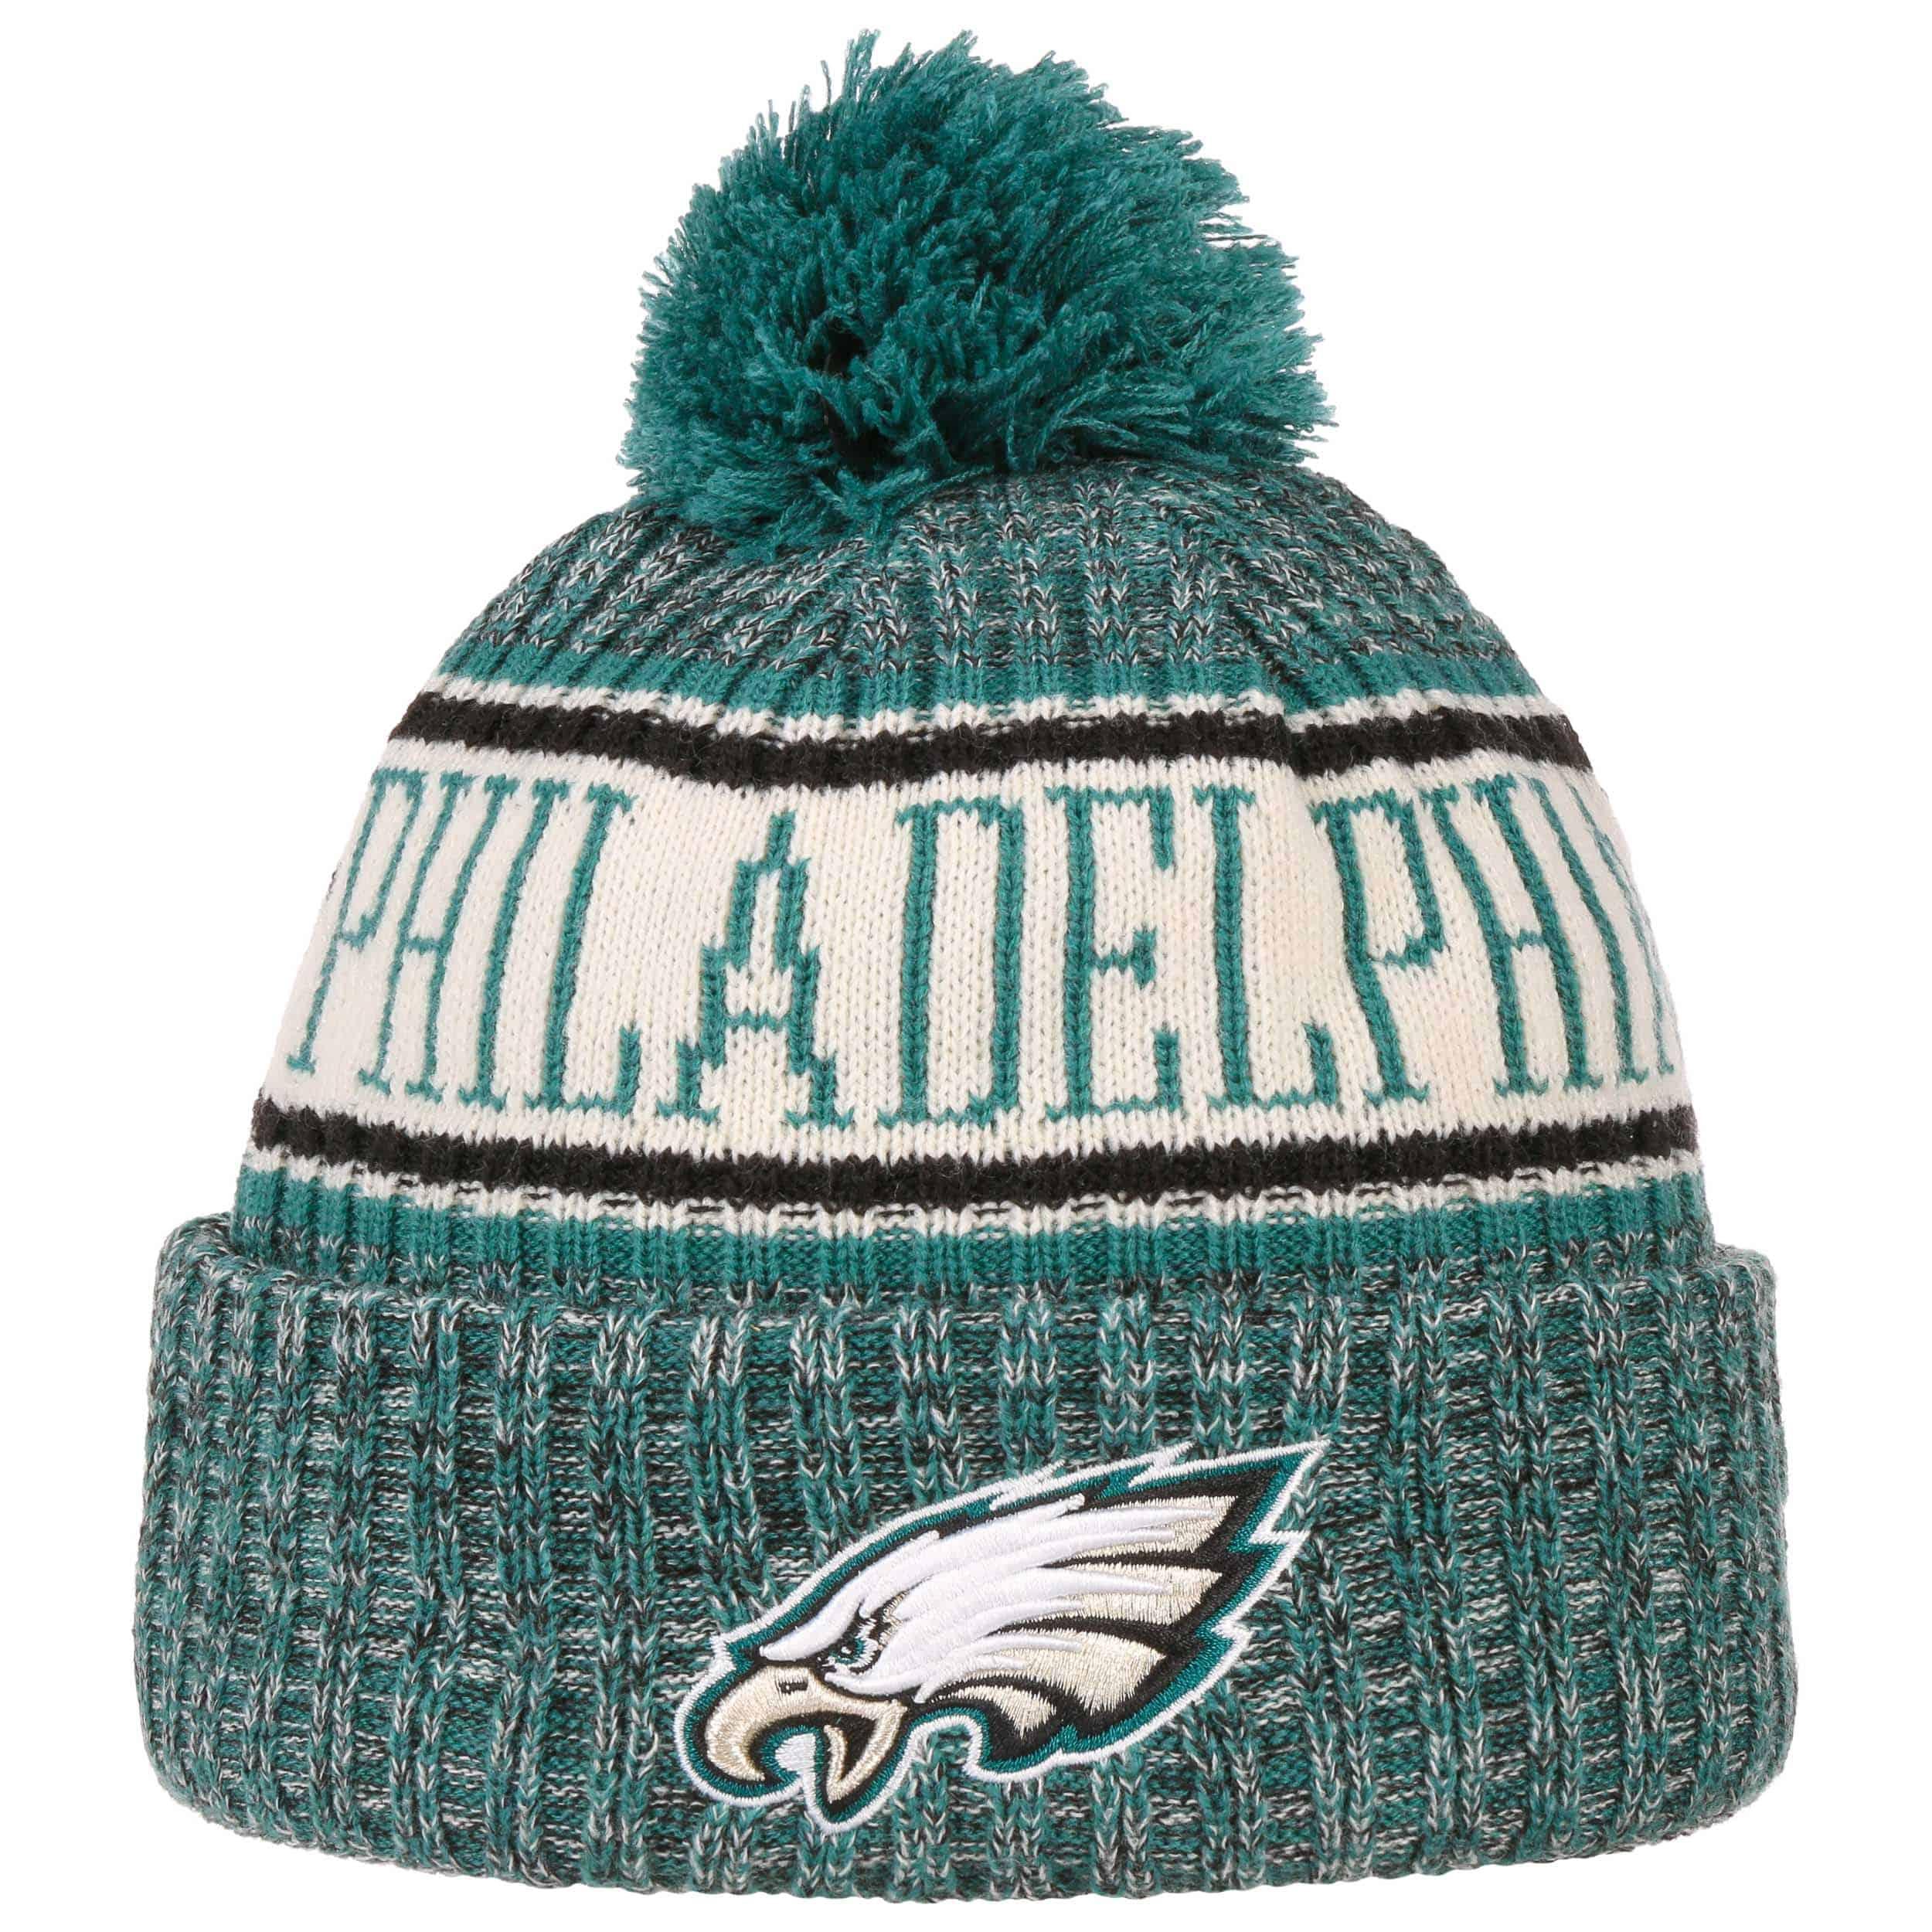 f735bb3e5053a On-Field 18 Eagles Beanie Hat. by New Era